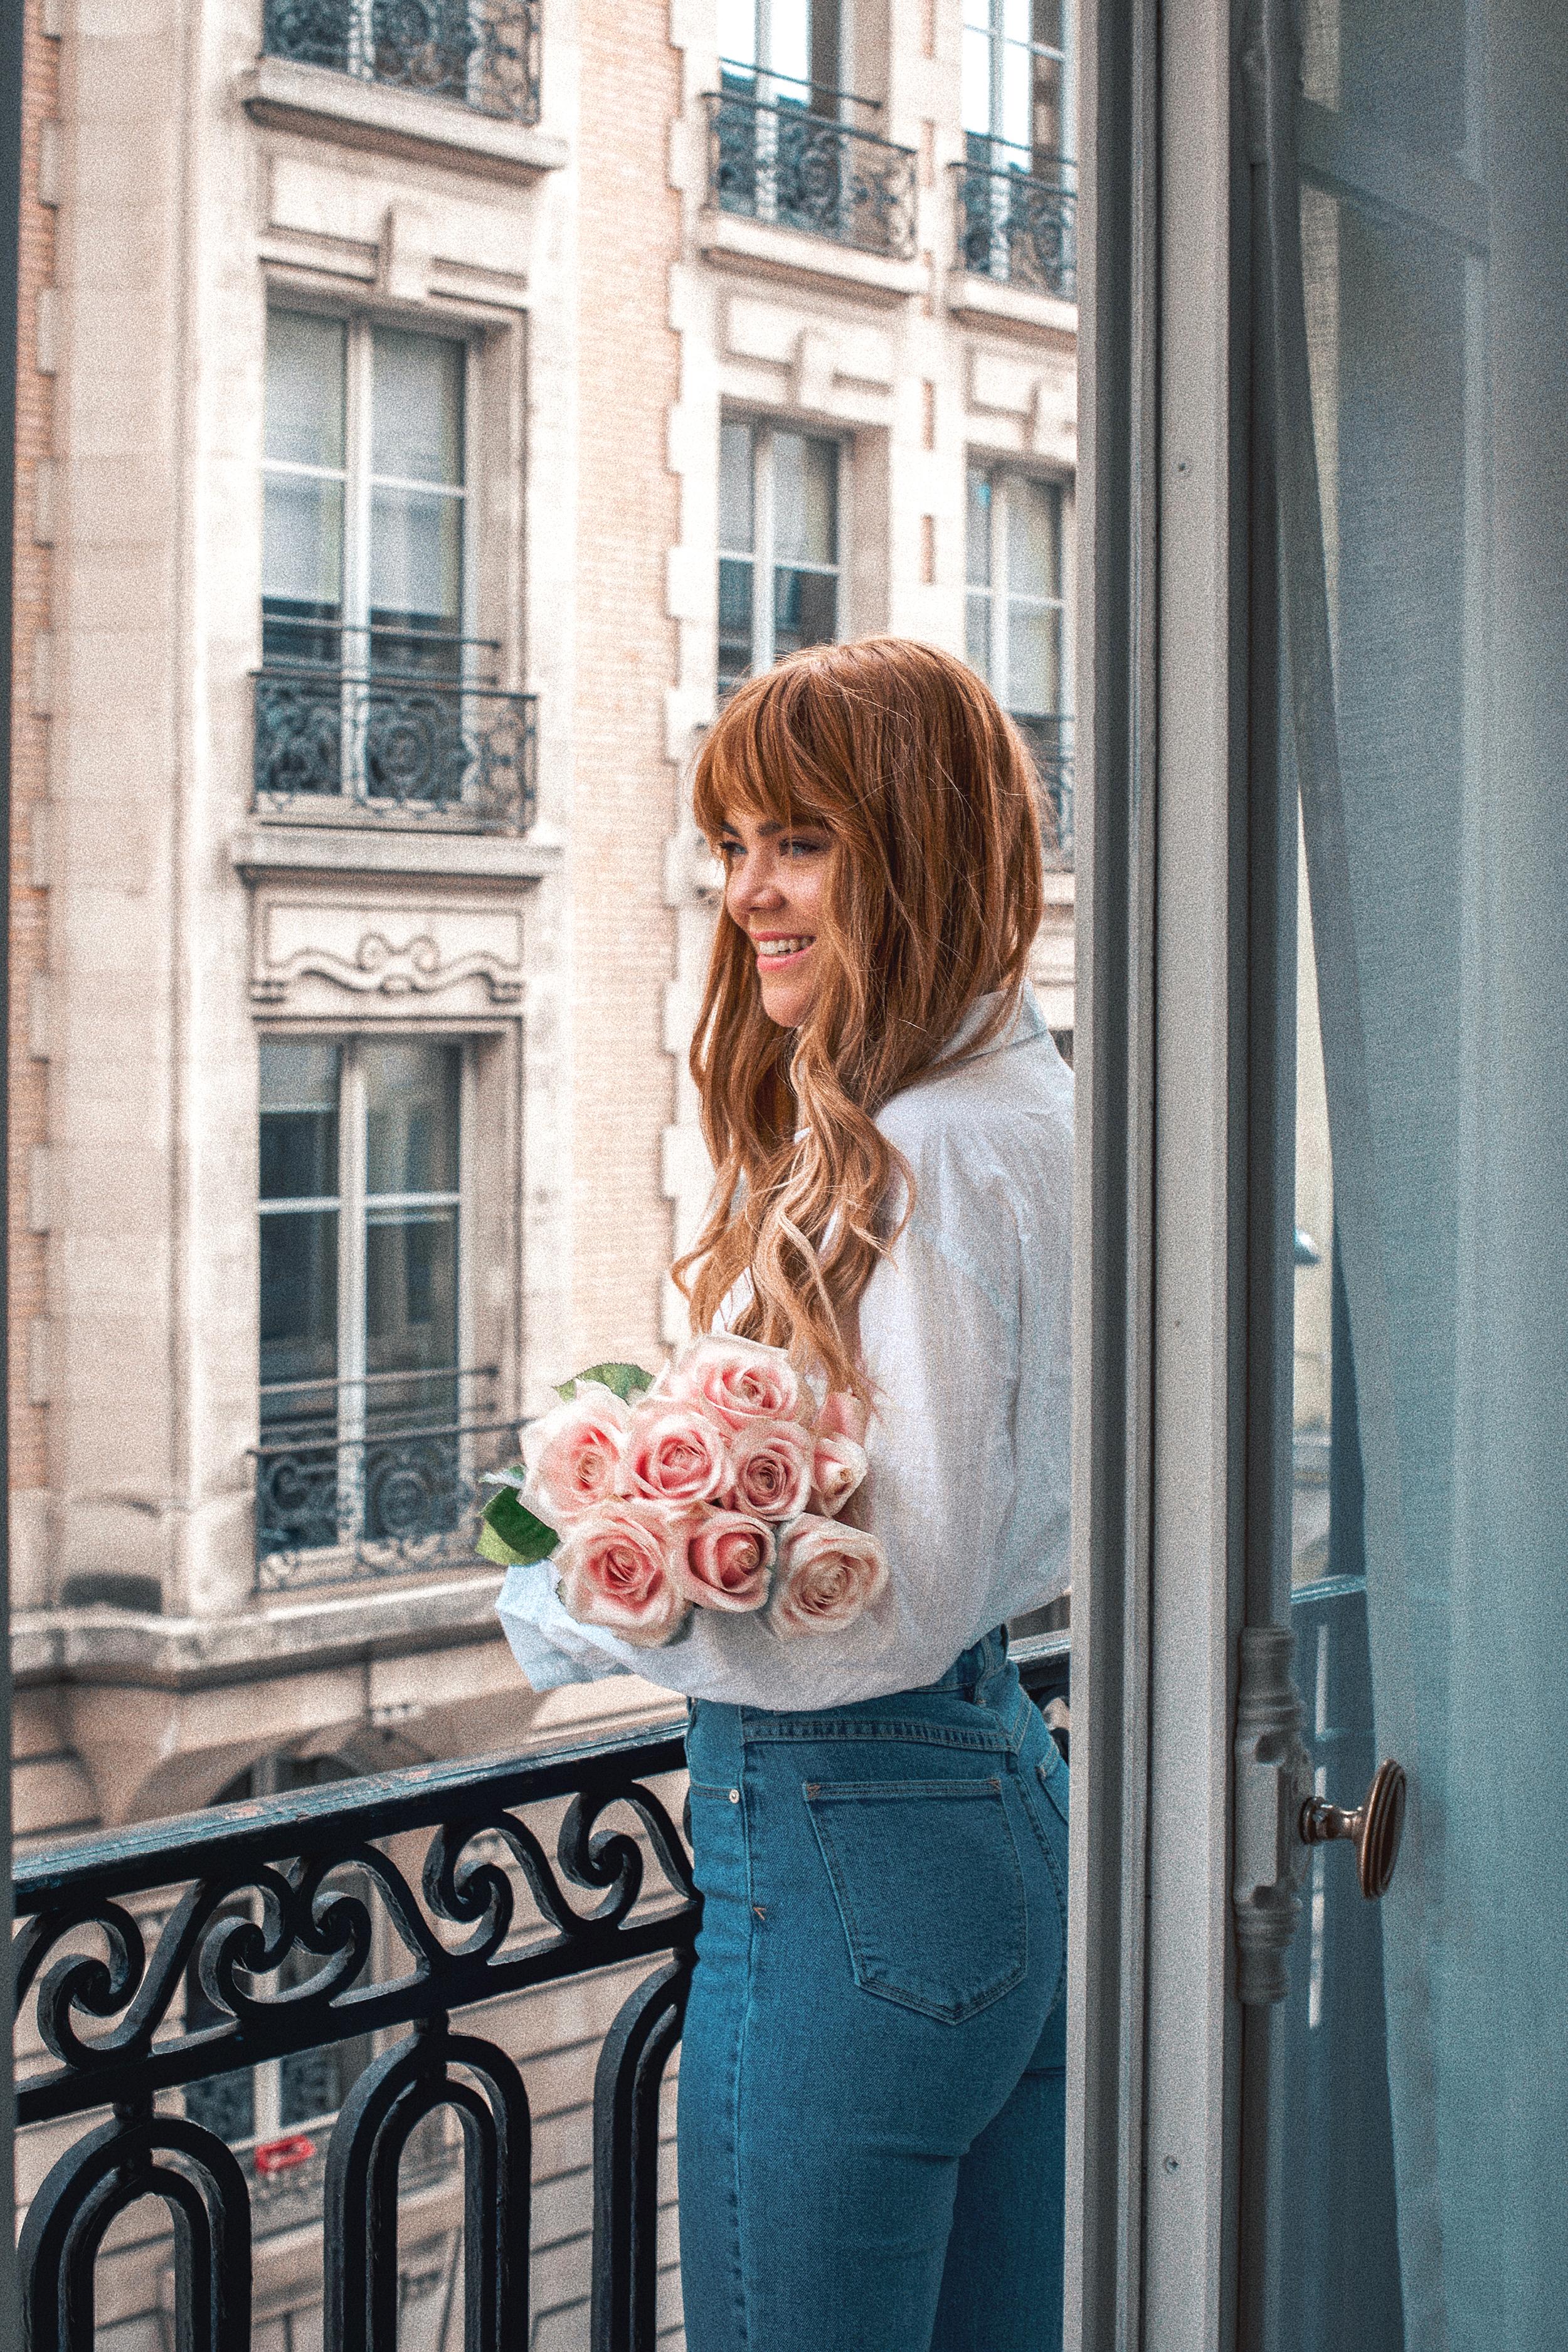 paris-hotel-balcony-romance-pink-roses_2.jpg